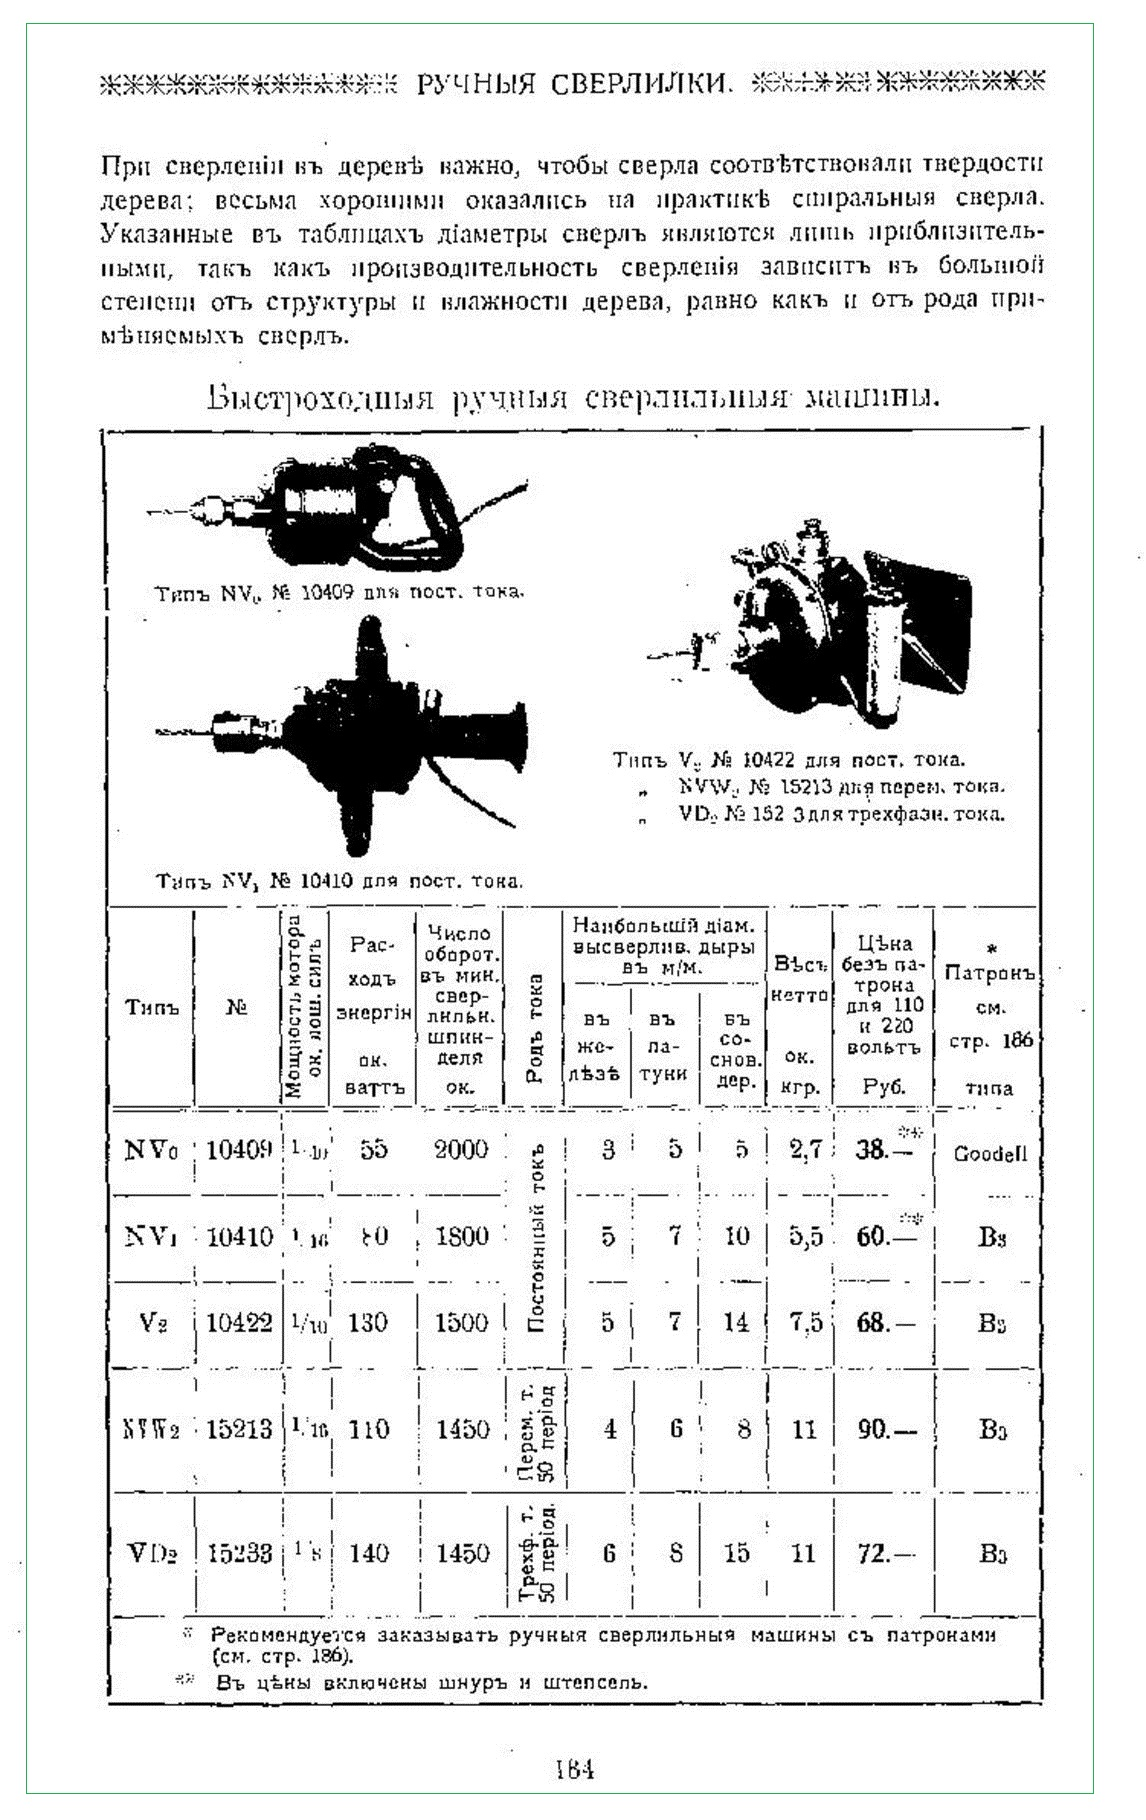 Цена на ручные электродрели 1913г